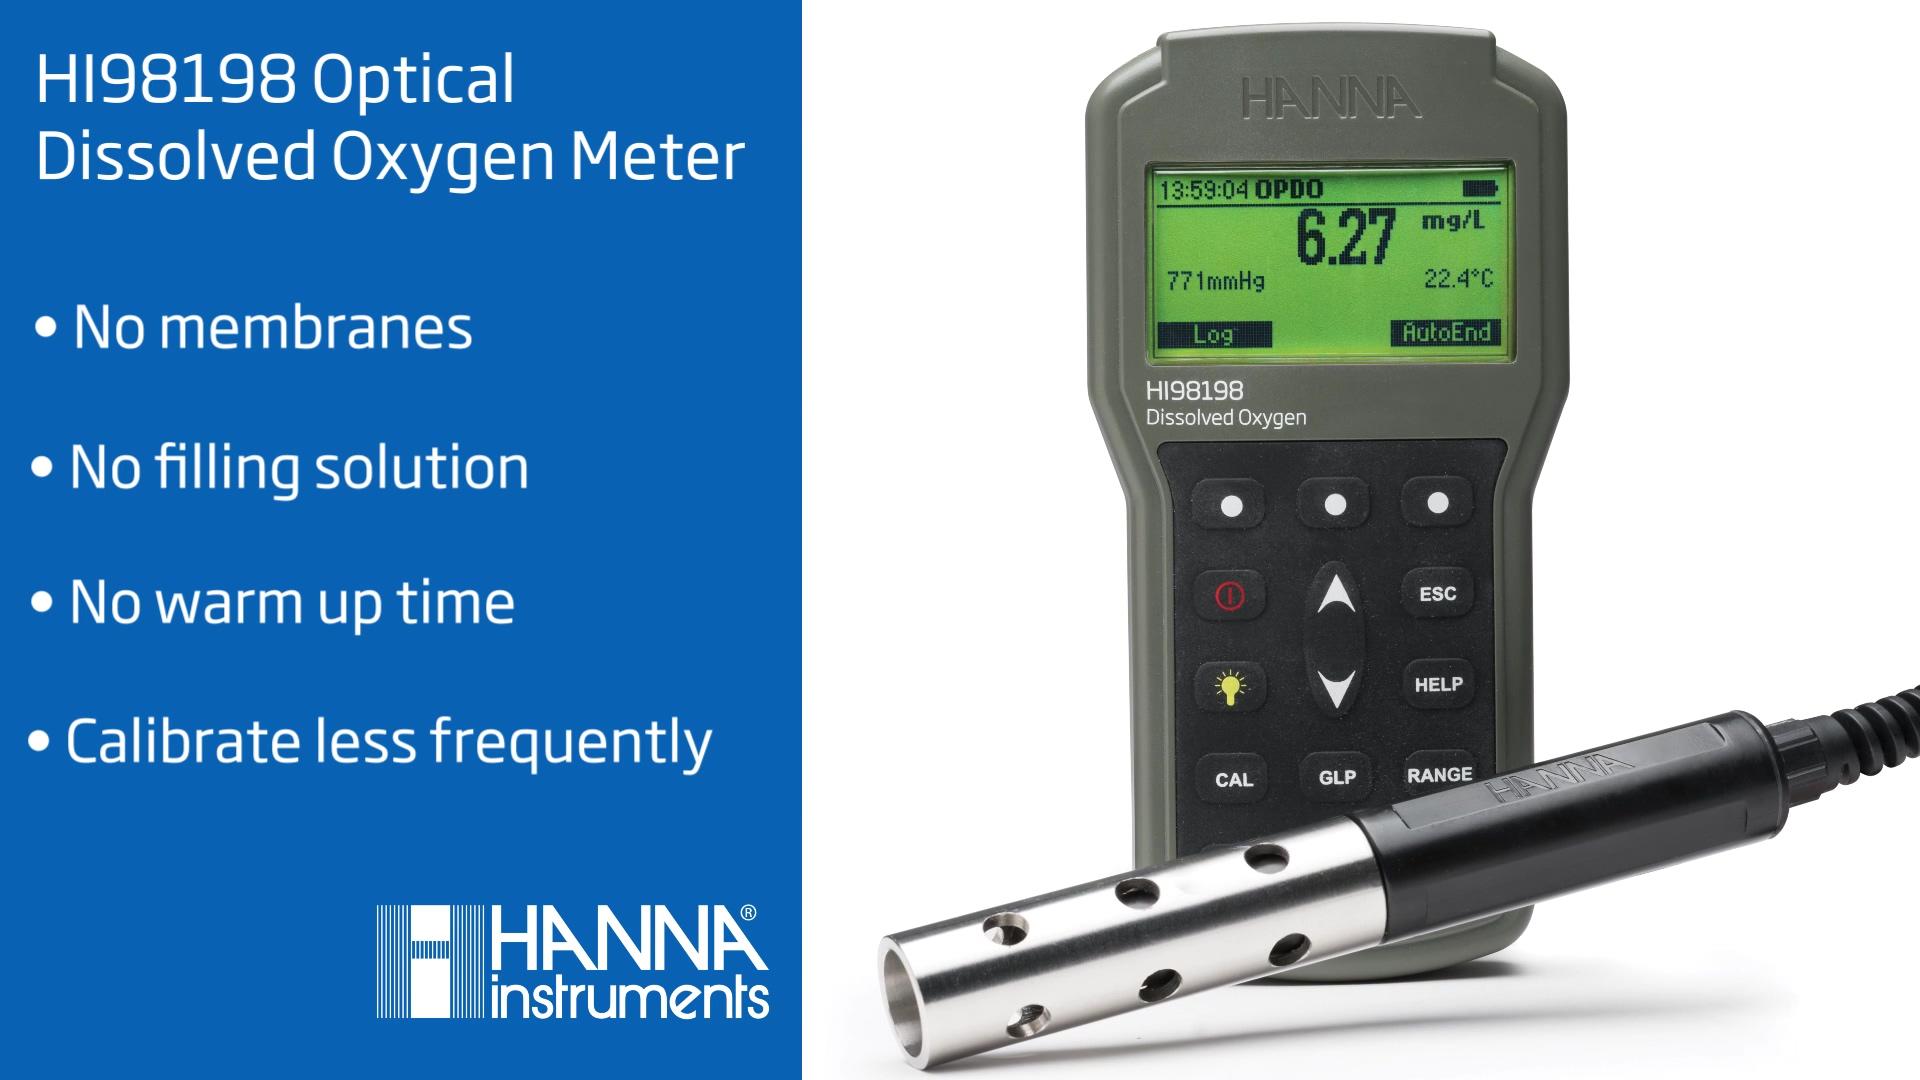 Hanna Instruments HI98198 Optical Dissolved Oxygen Meter